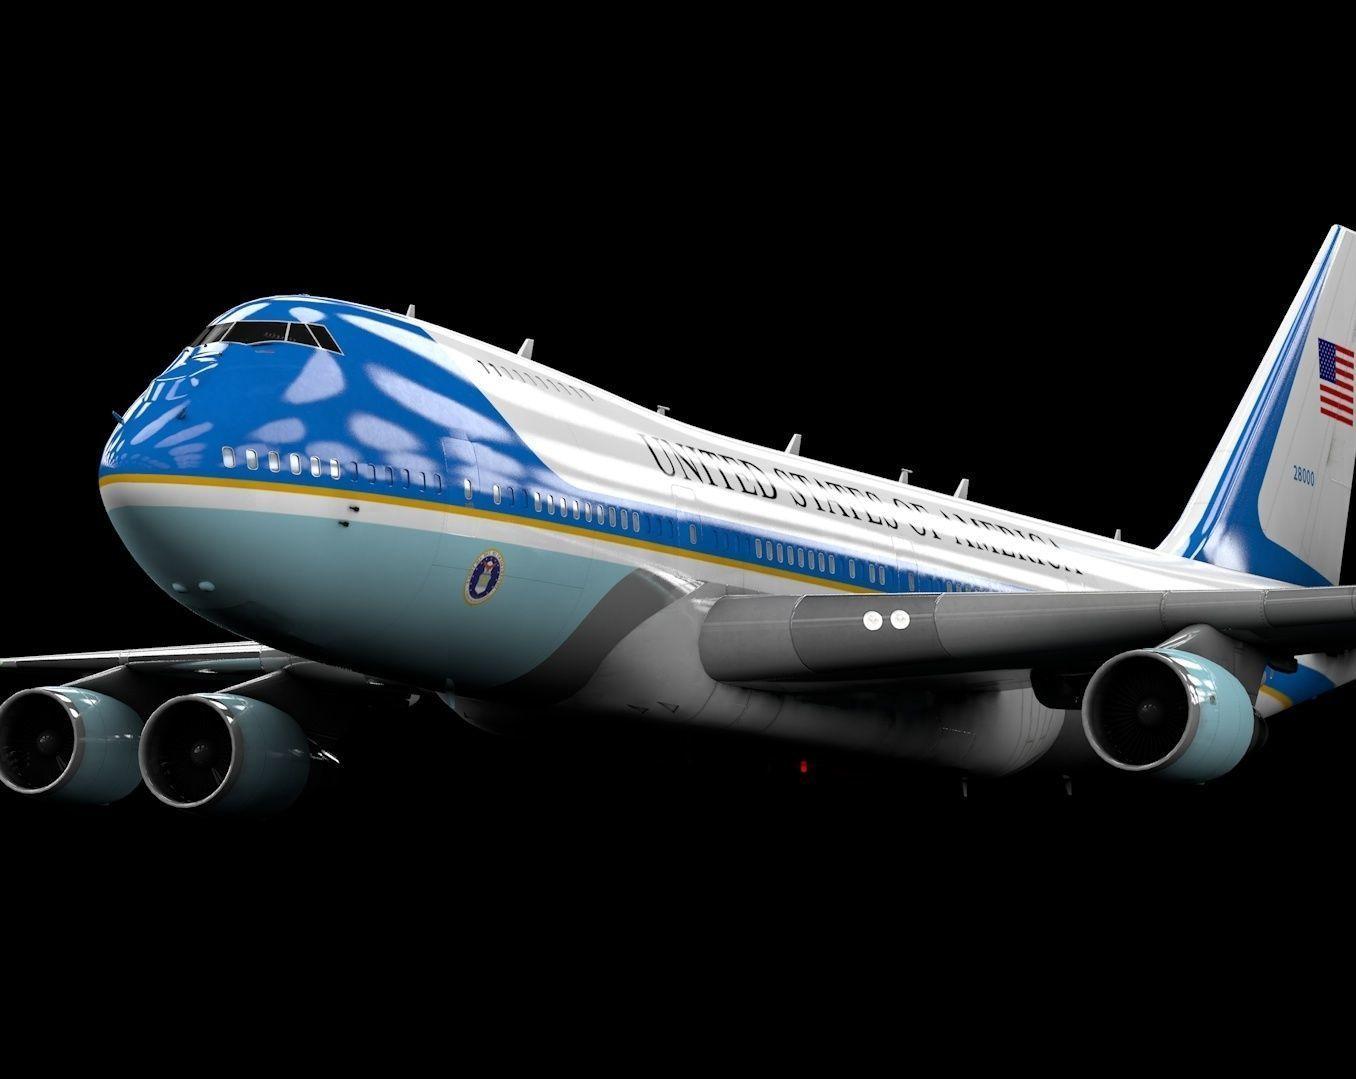 Boeing 747-400 Air Force One Model -  C4d-Fbx-Maya-Obj